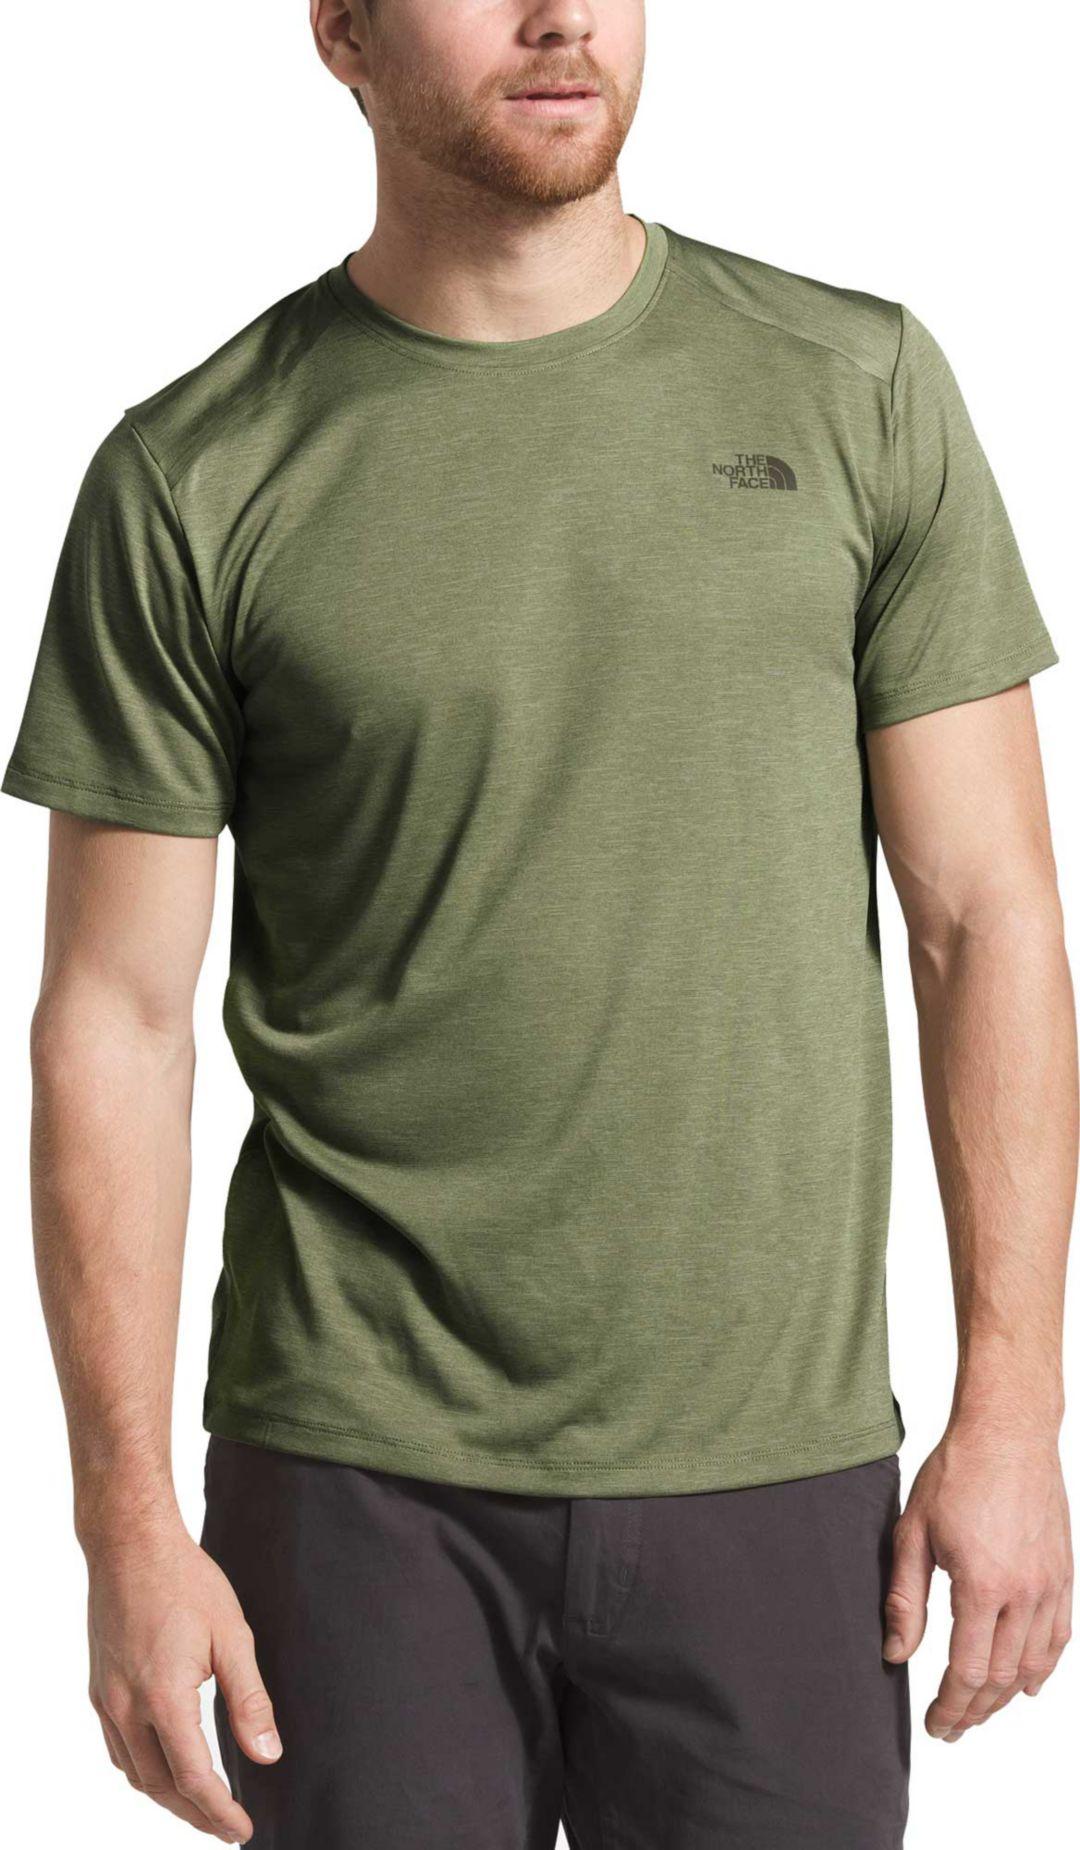 a3704b695 The North Face Men's HyperLayer FlashDry Short Sleeve Crew T-Shirt